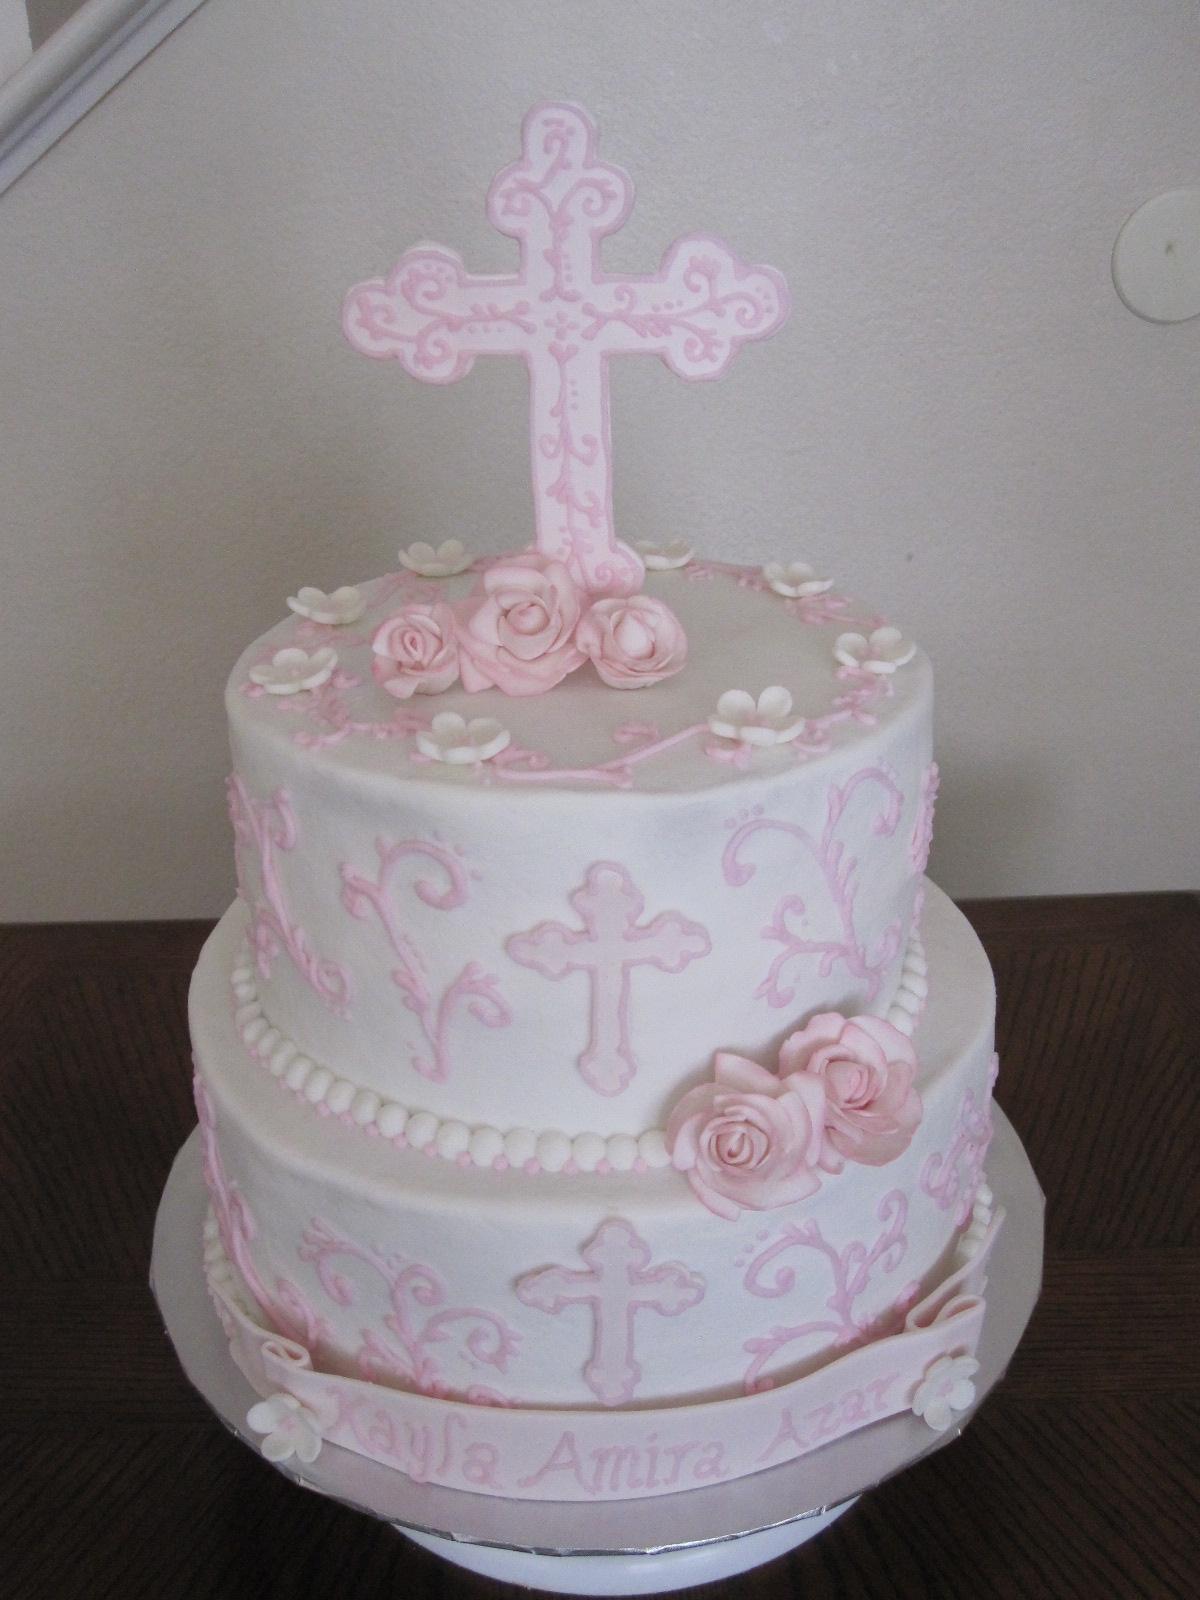 Cake Ideas For Baby Baptism : Baby Shower Cakes: Baptism Cake